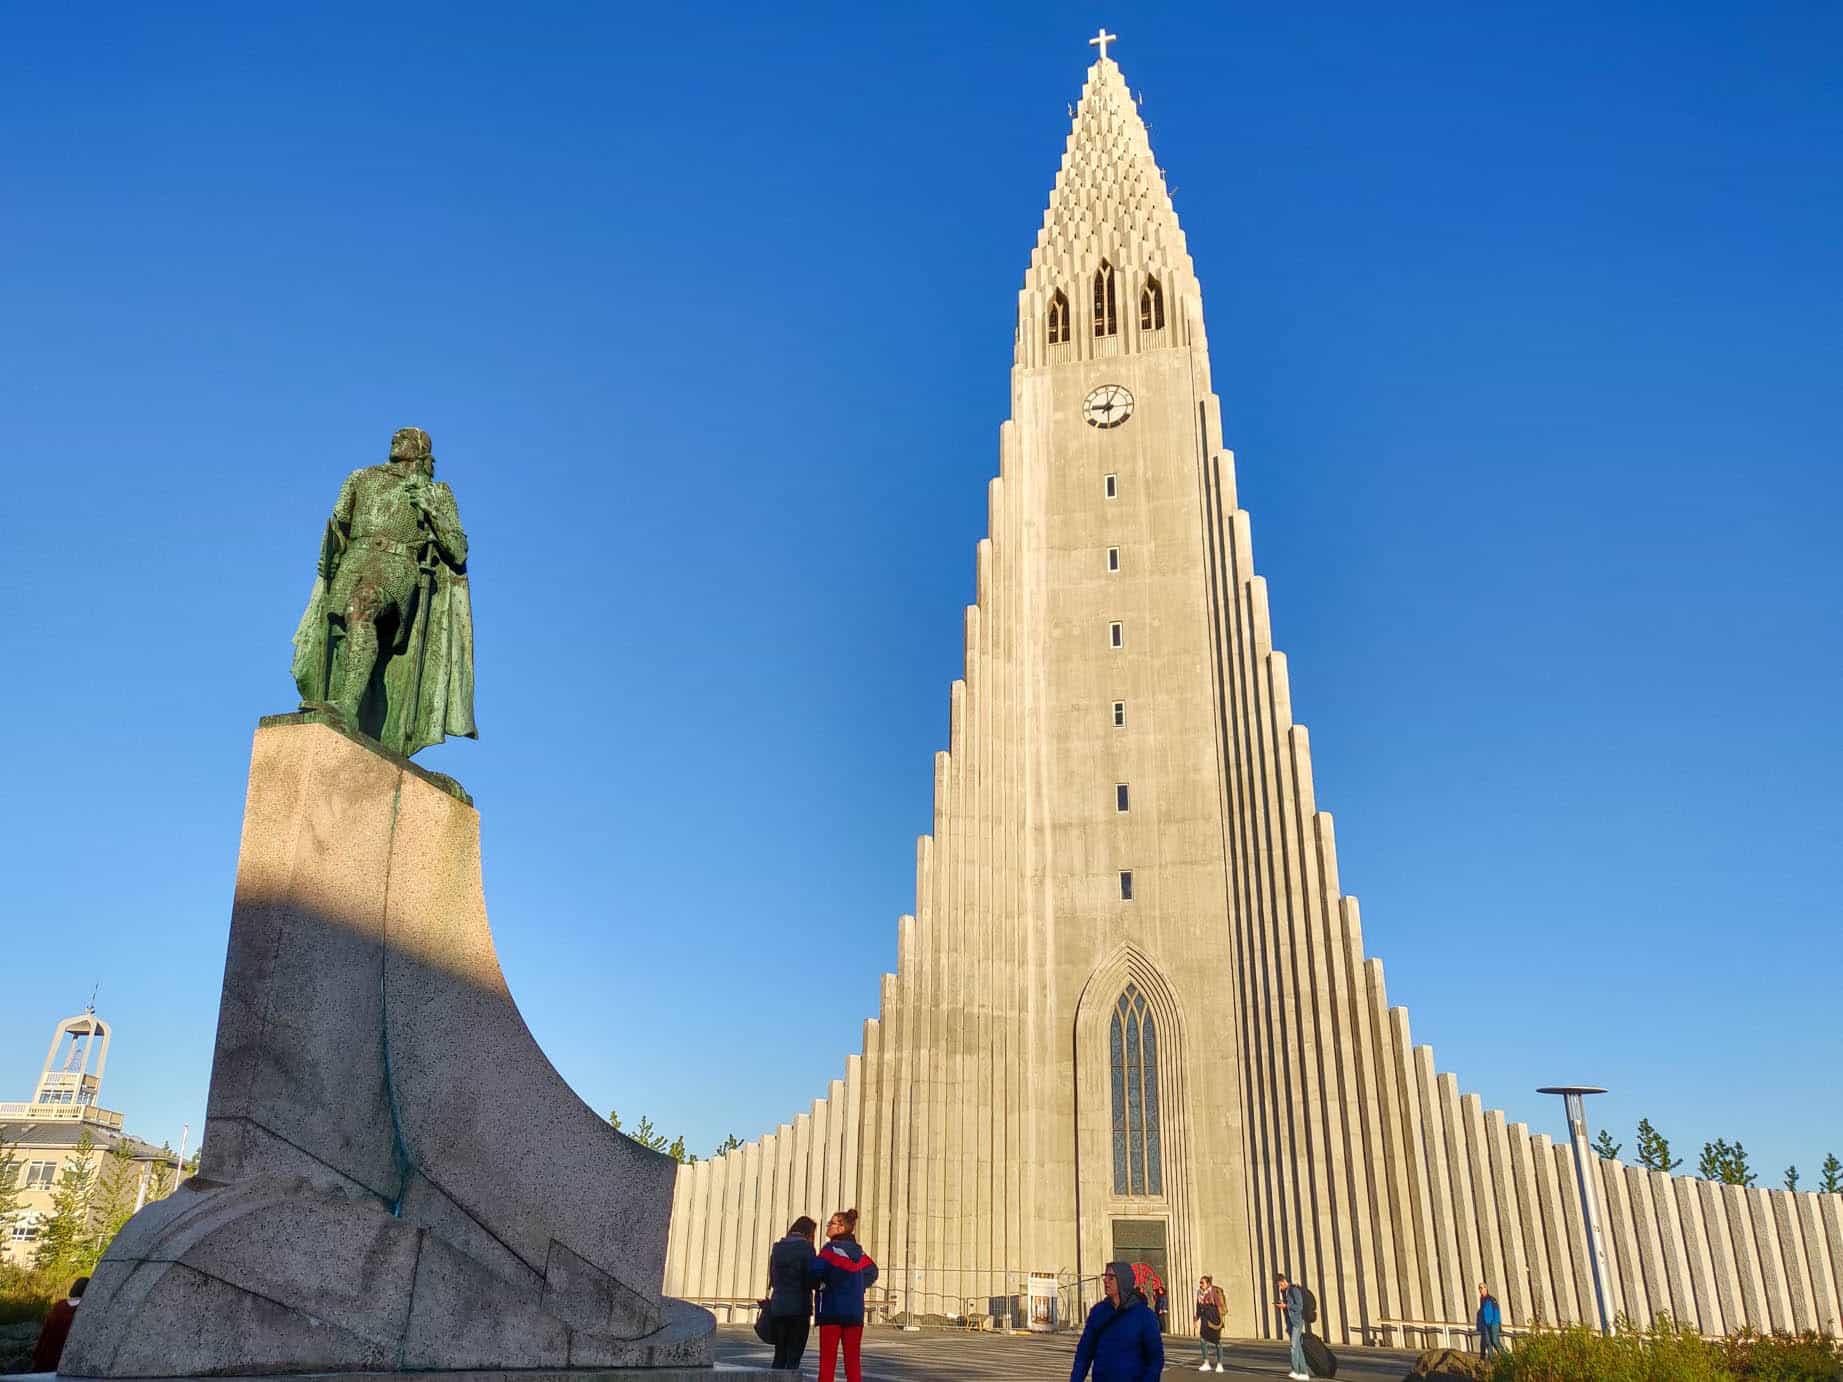 Reykjavik Hallgrimskirkja